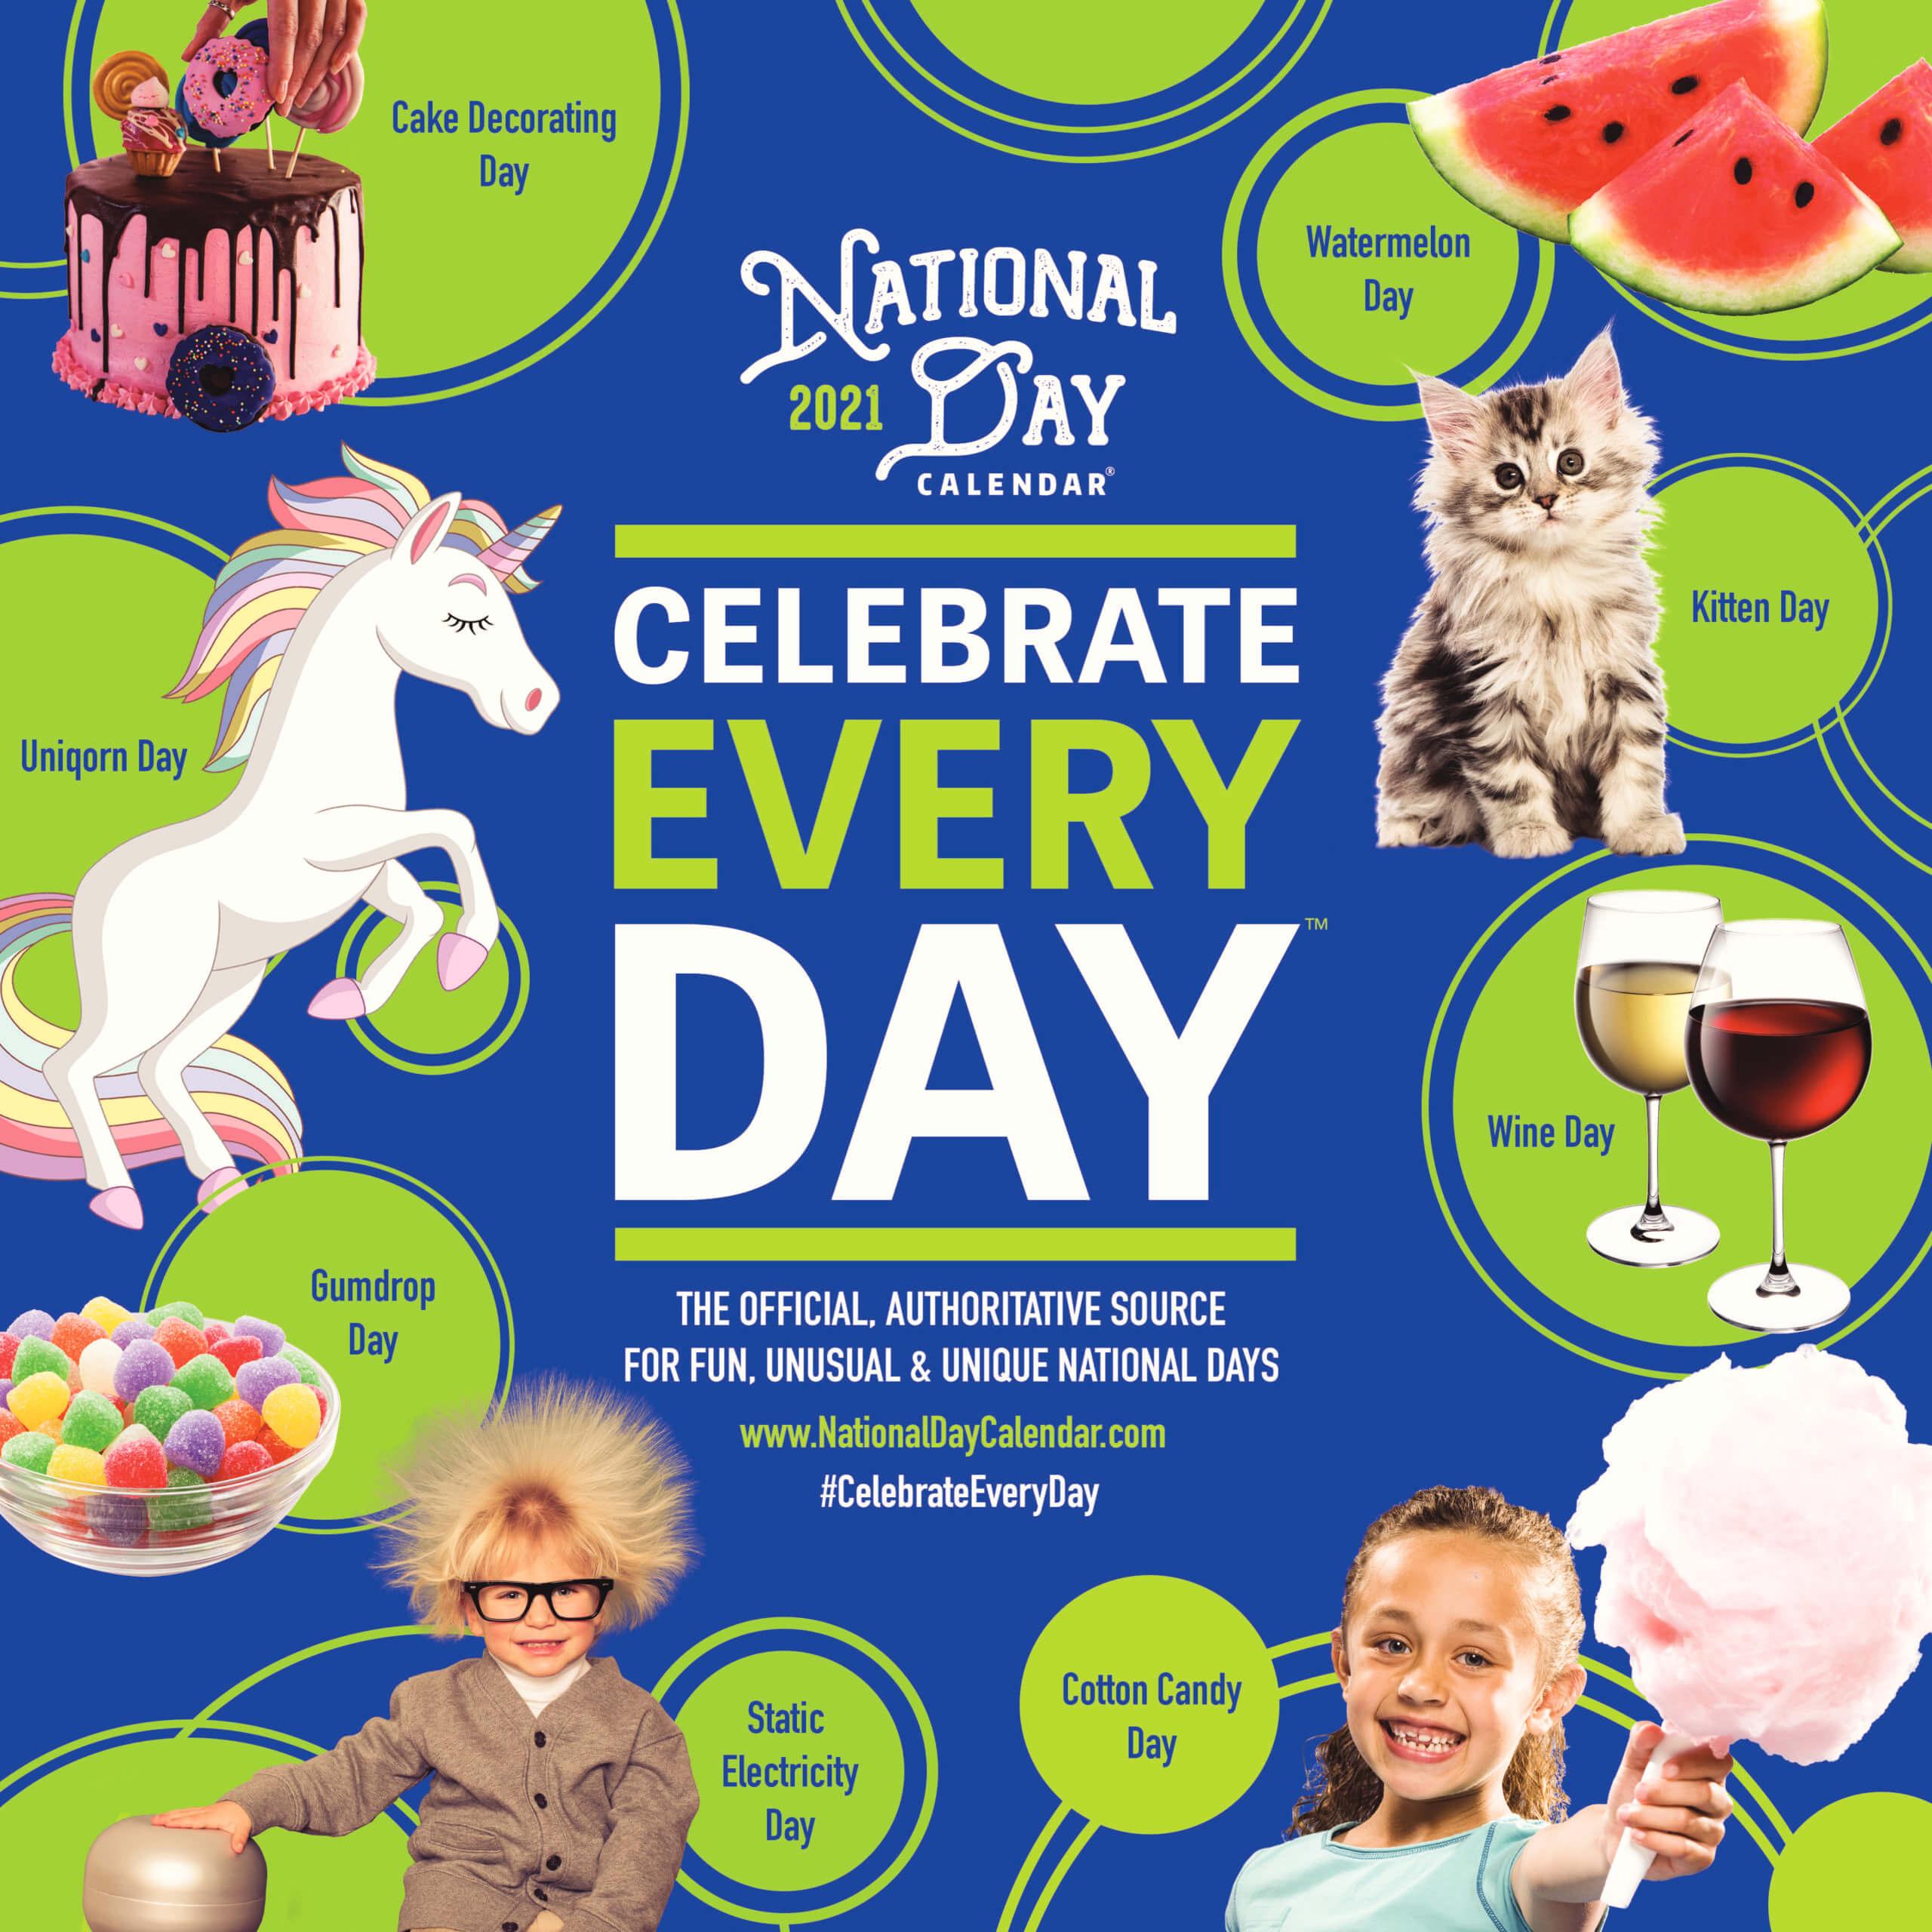 Photos of 2021 National Day Calendar